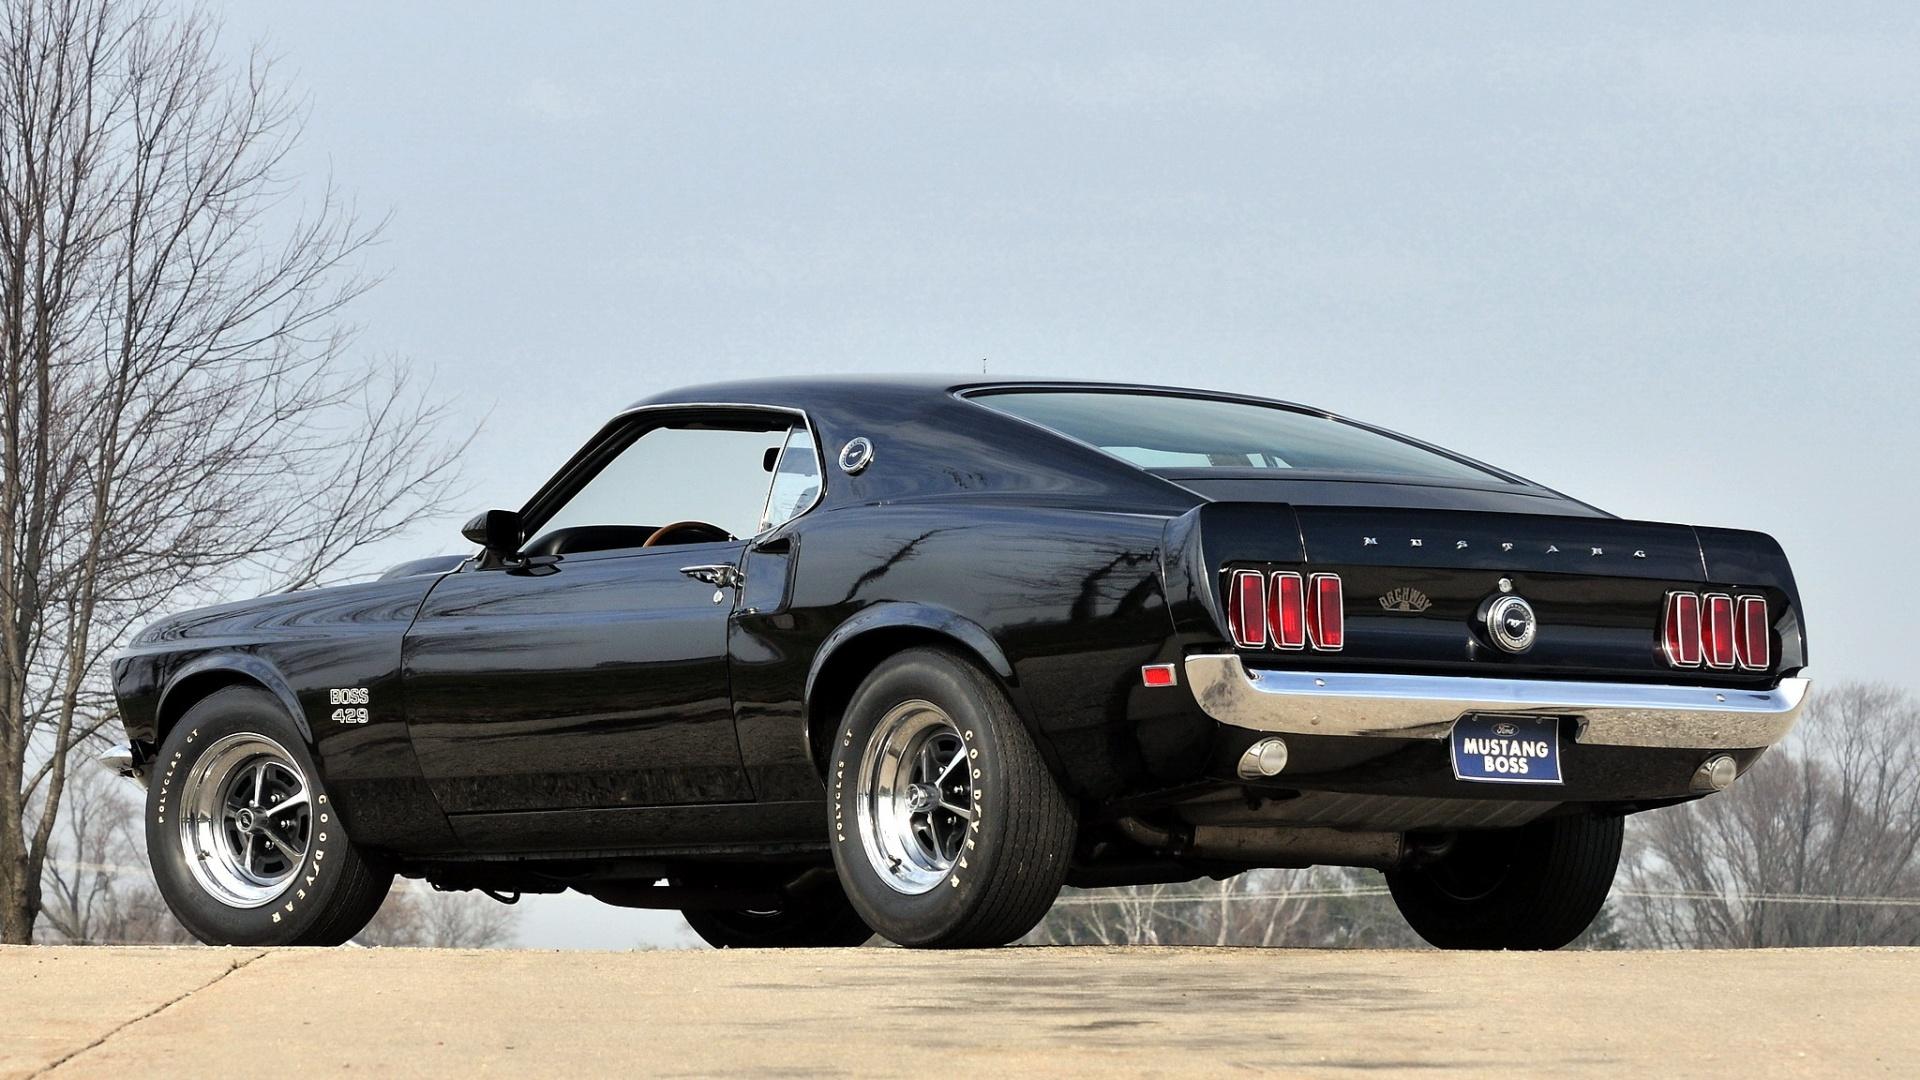 Baixar-chefe-muscle-car-ford-mustang-Mustang-volta-de-preto-preto-Ford-wallpaper-wp3402830